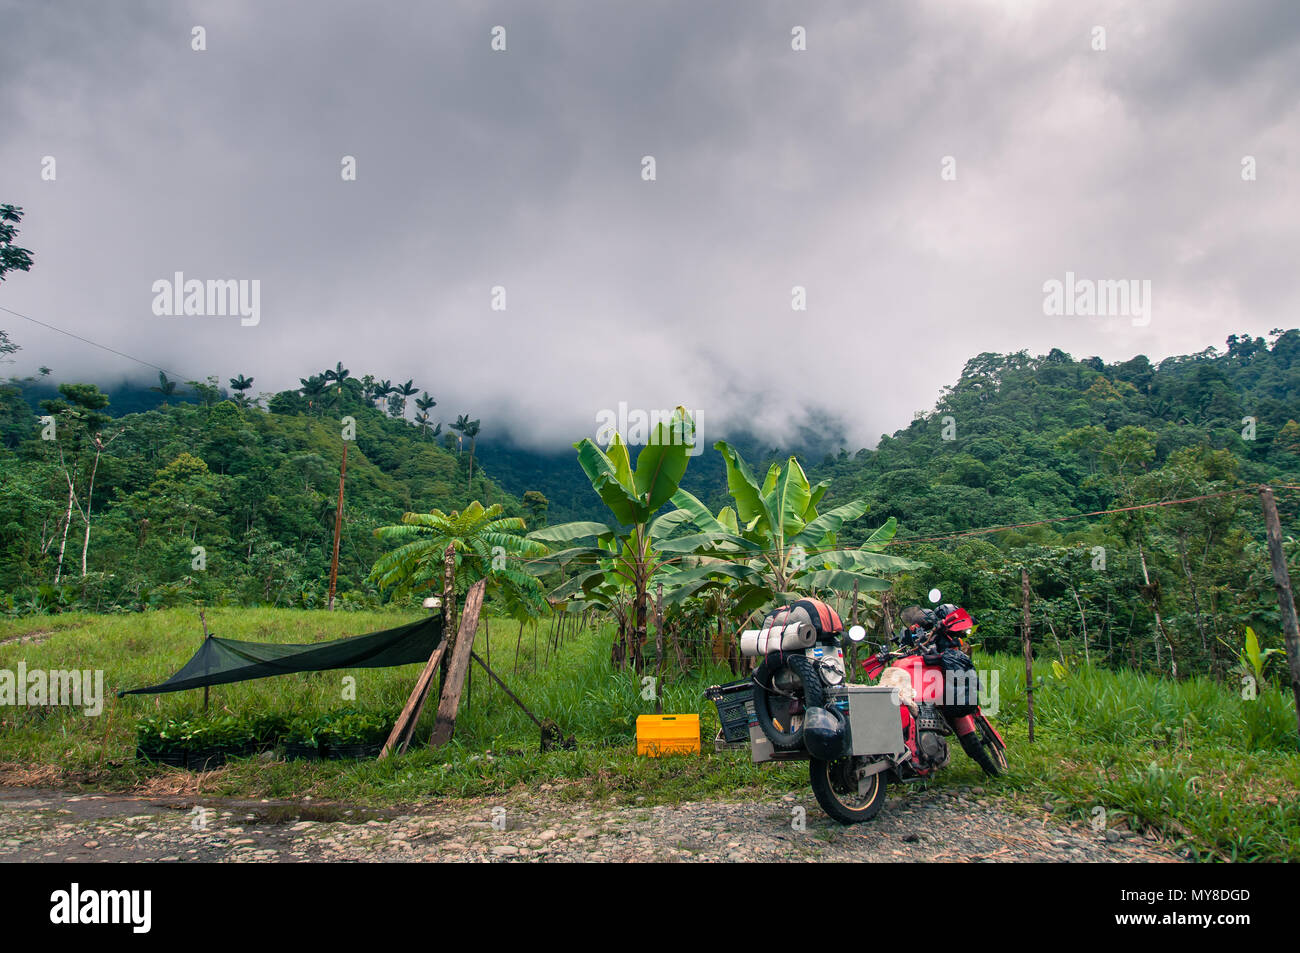 Hamac en moto et en milieu rural, Quito, Pichincha, Equateur Photo Stock